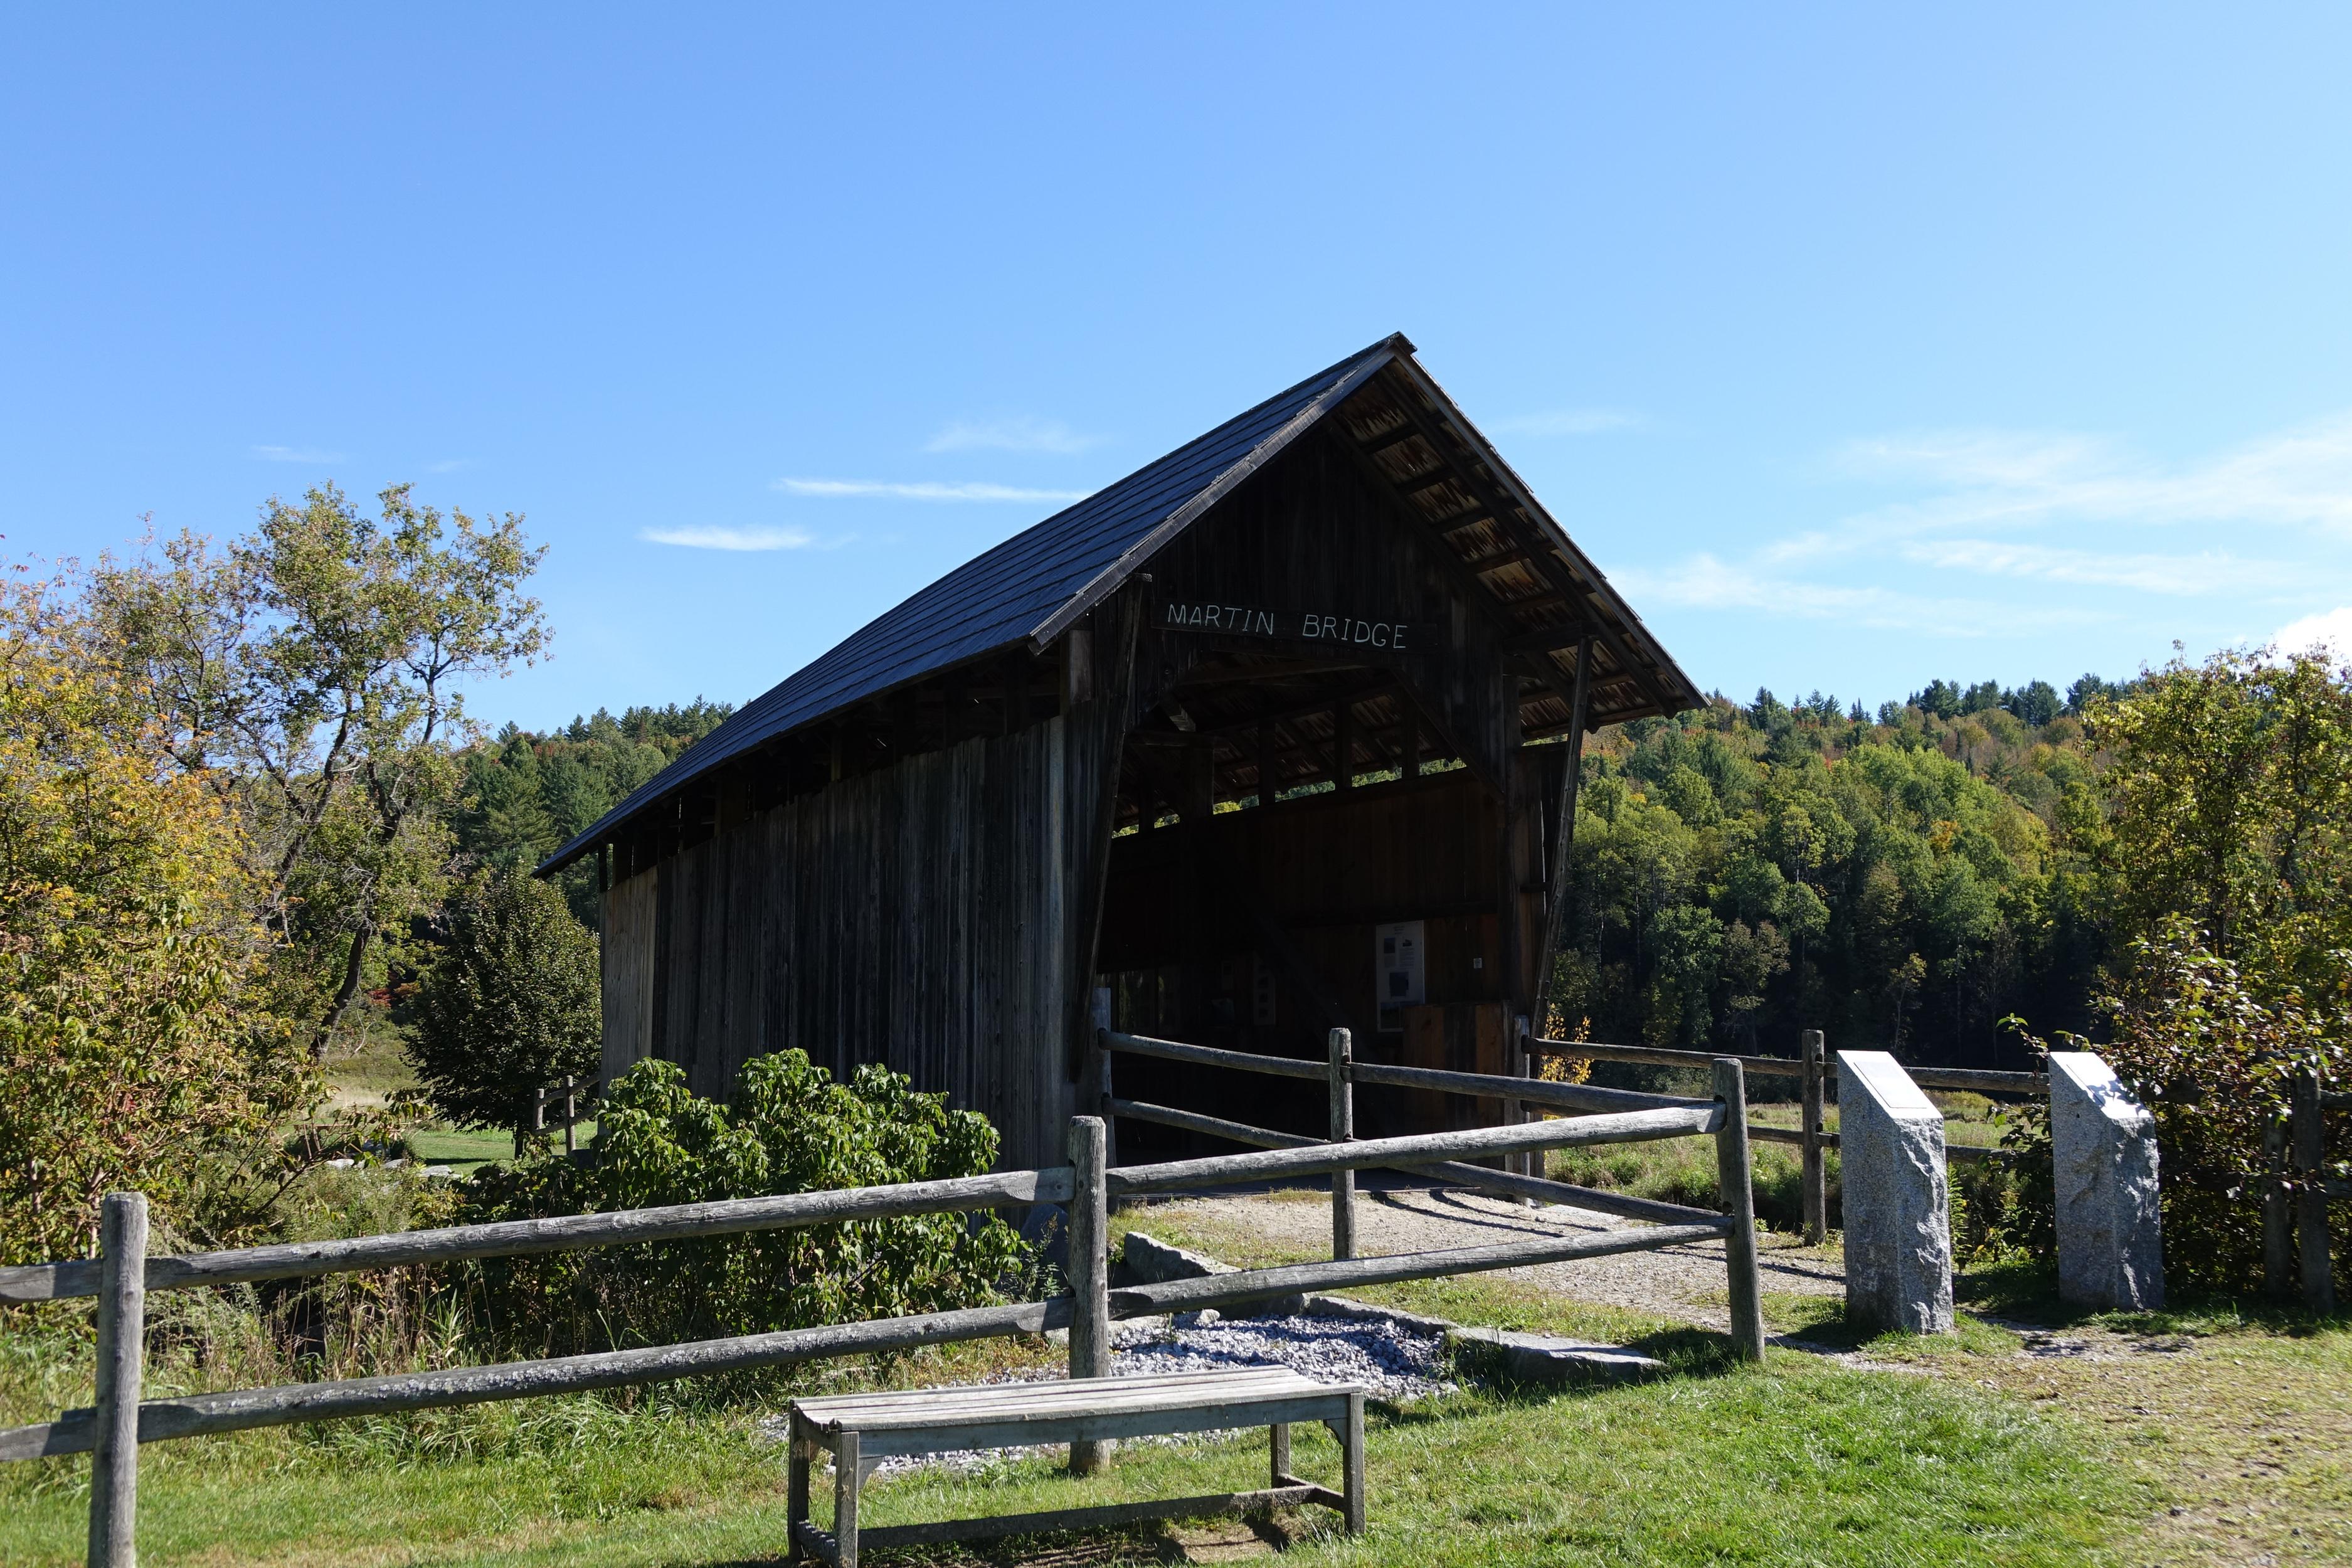 Marshfield Martin Covered Bridge